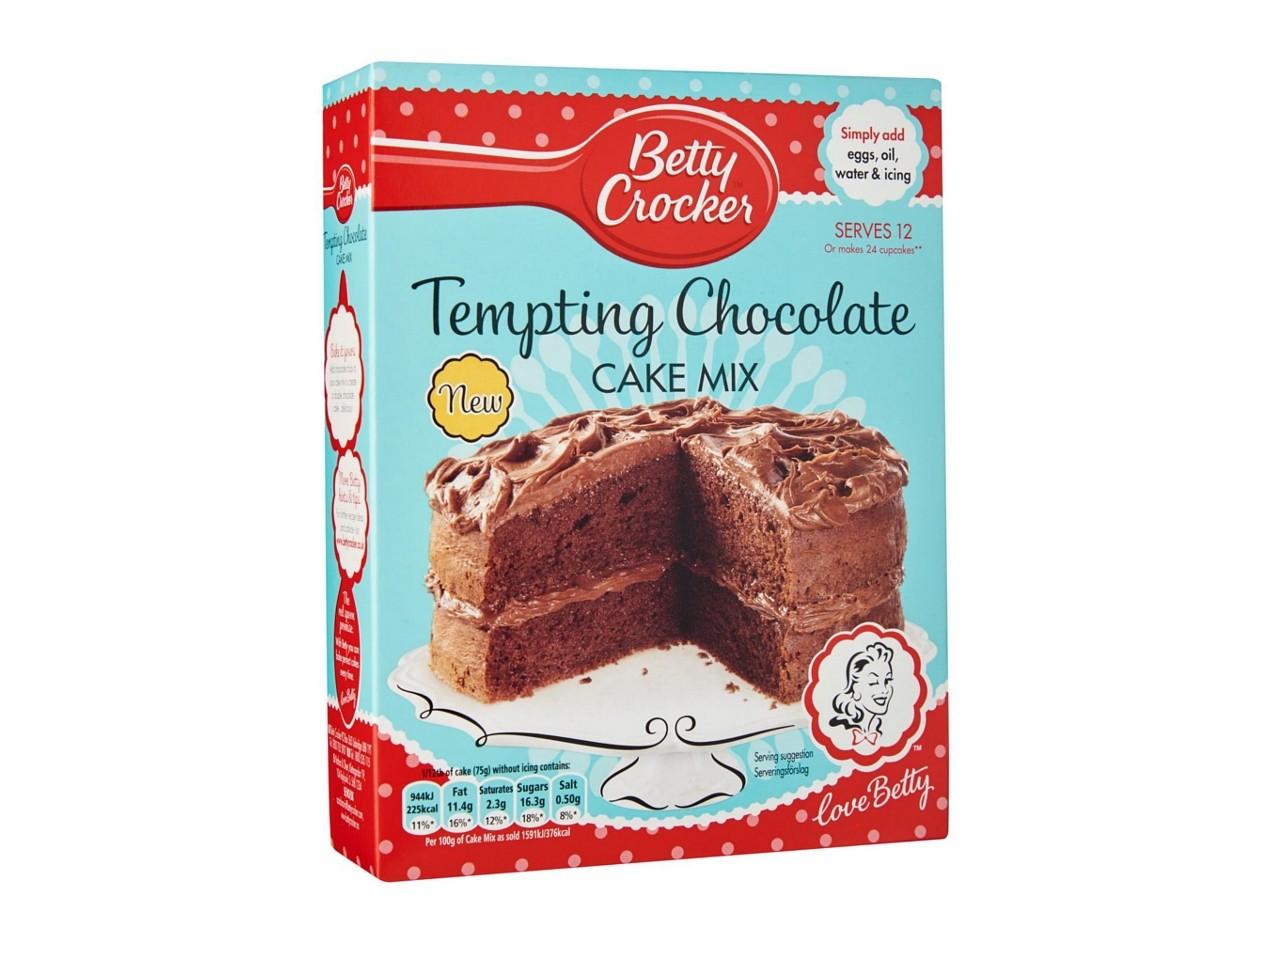 Betty Crocker Tempting Chocolate Cake Mix 425g Manufacturer